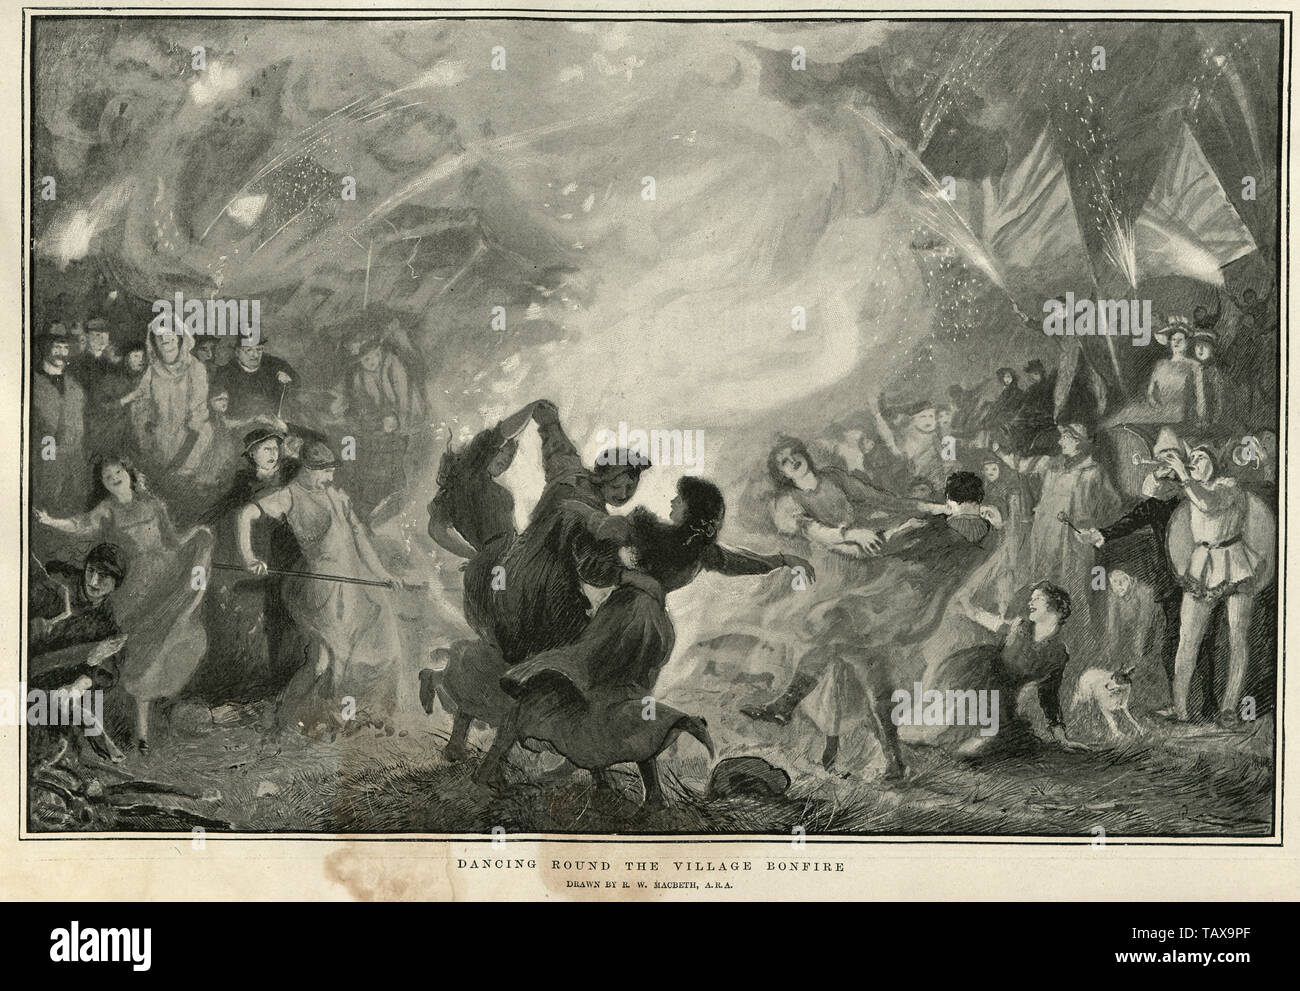 Dancing round the village bonfire, after Robert Walker Macbeth, 1902 Stock Photo